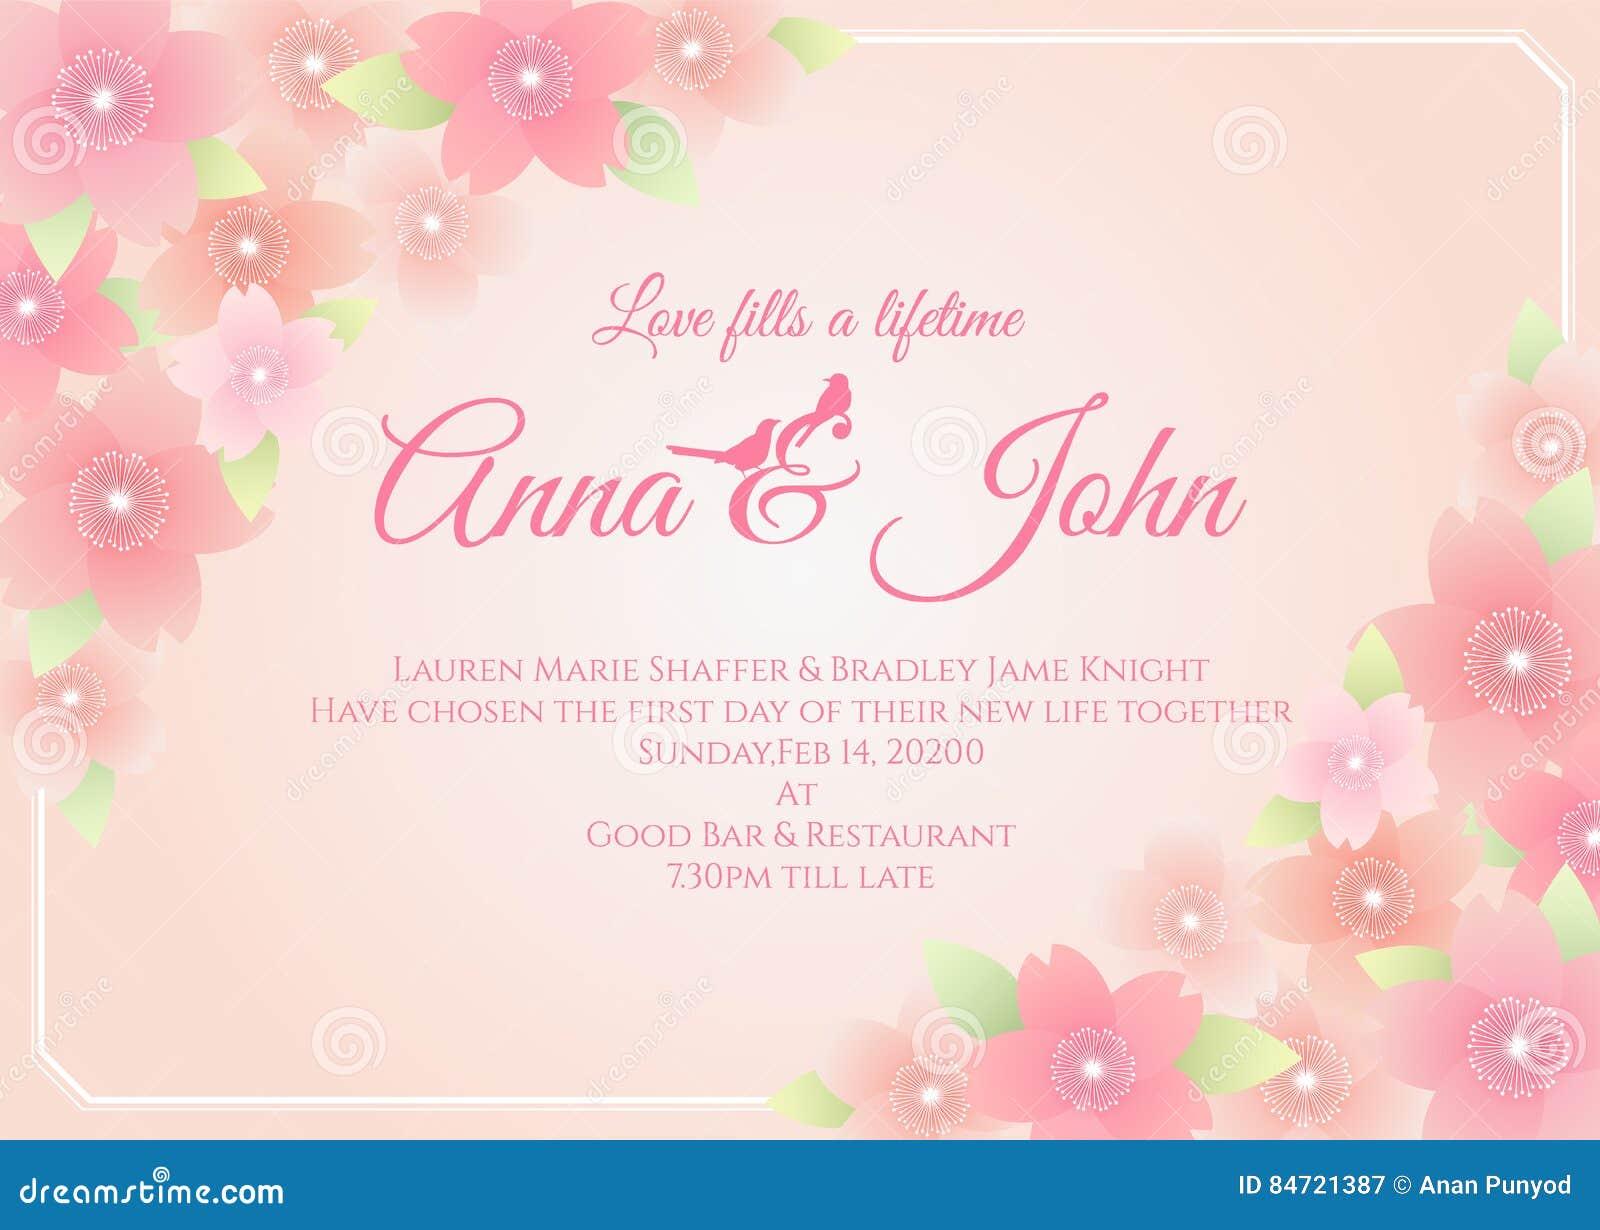 wedding card - sakura flower frame on soft pink background vector